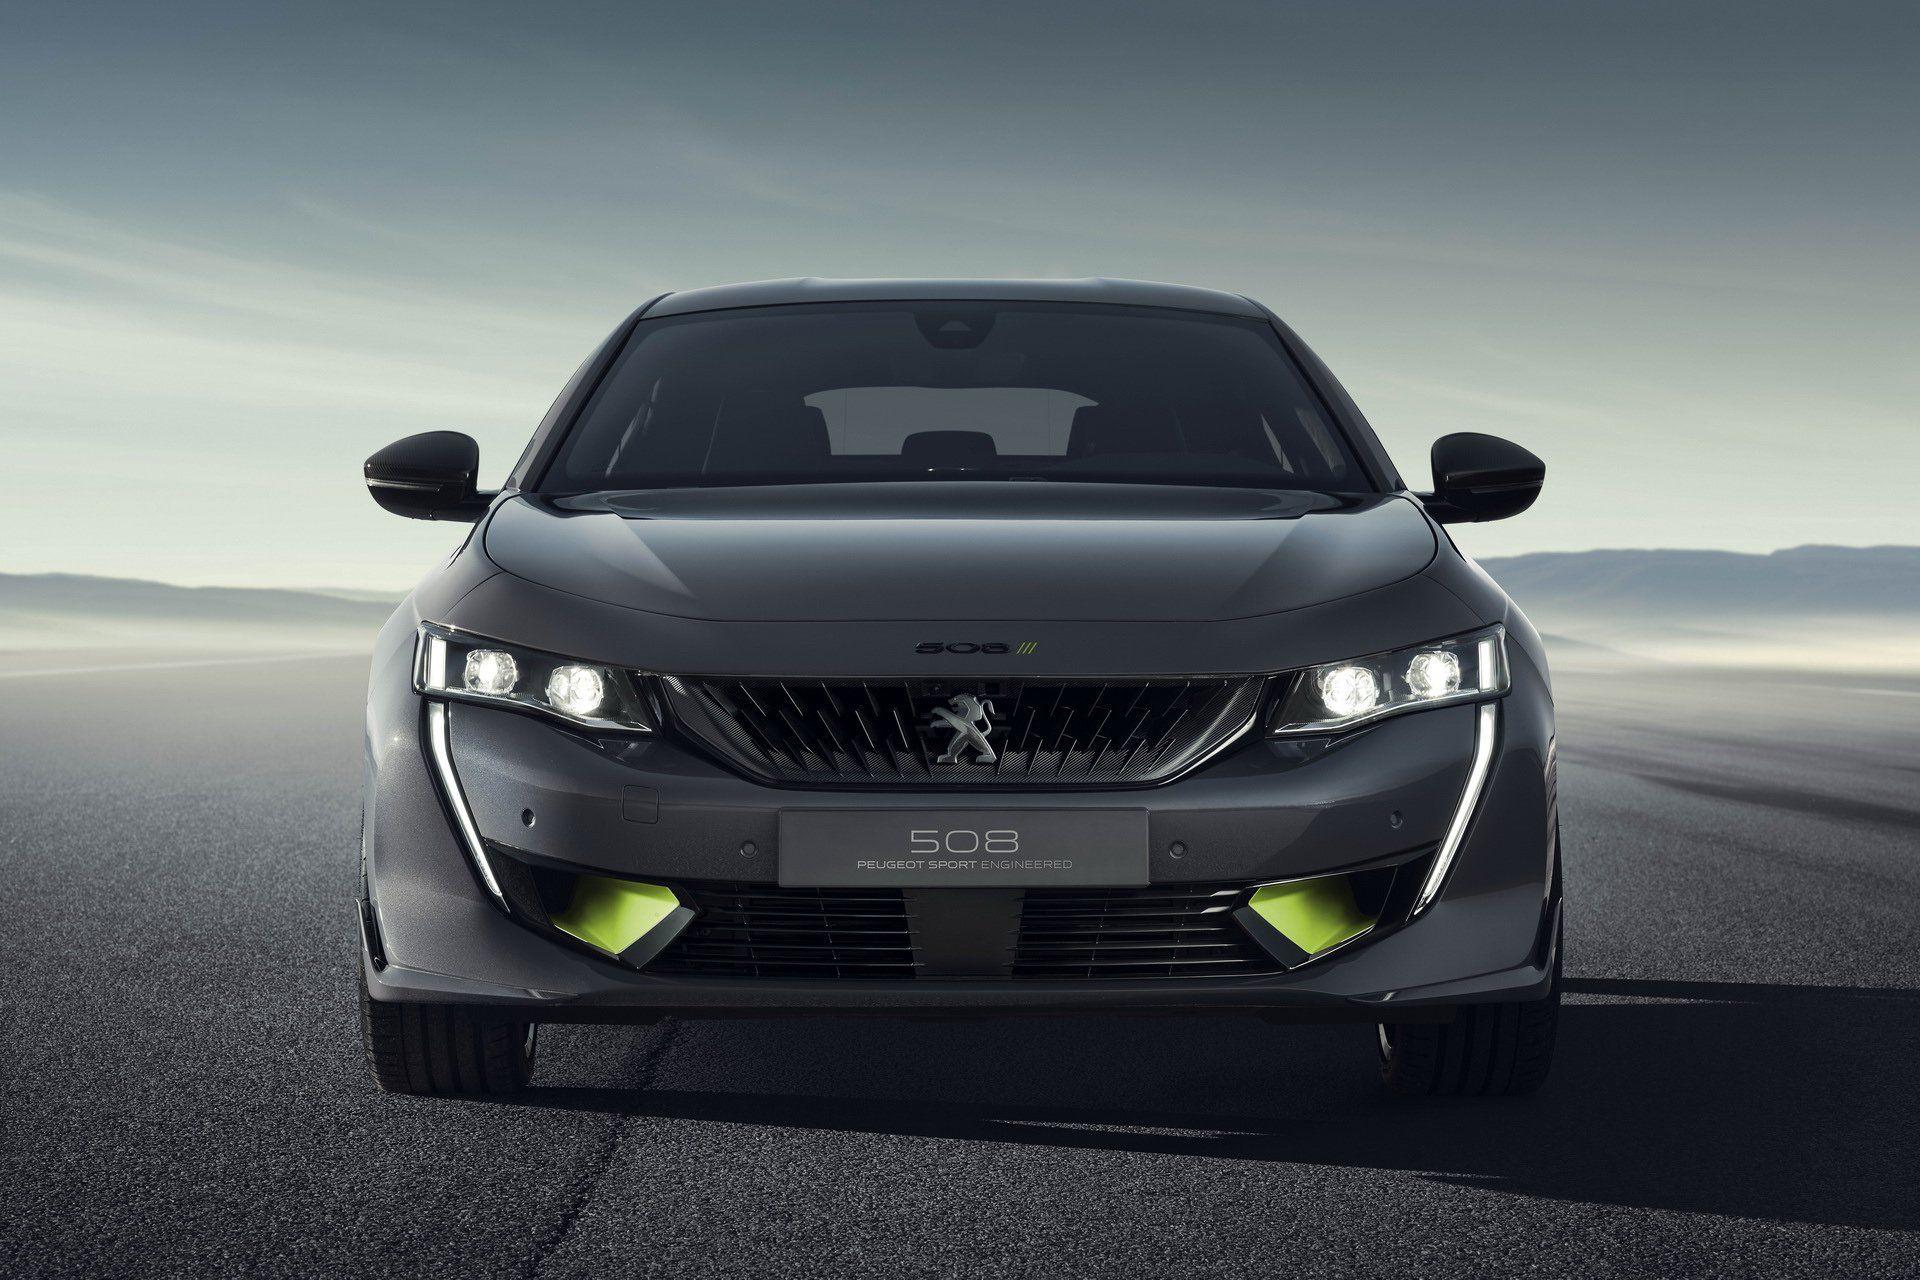 Peugeot 508 Sport Engineered Concept Revealed Ahead Of Geneva